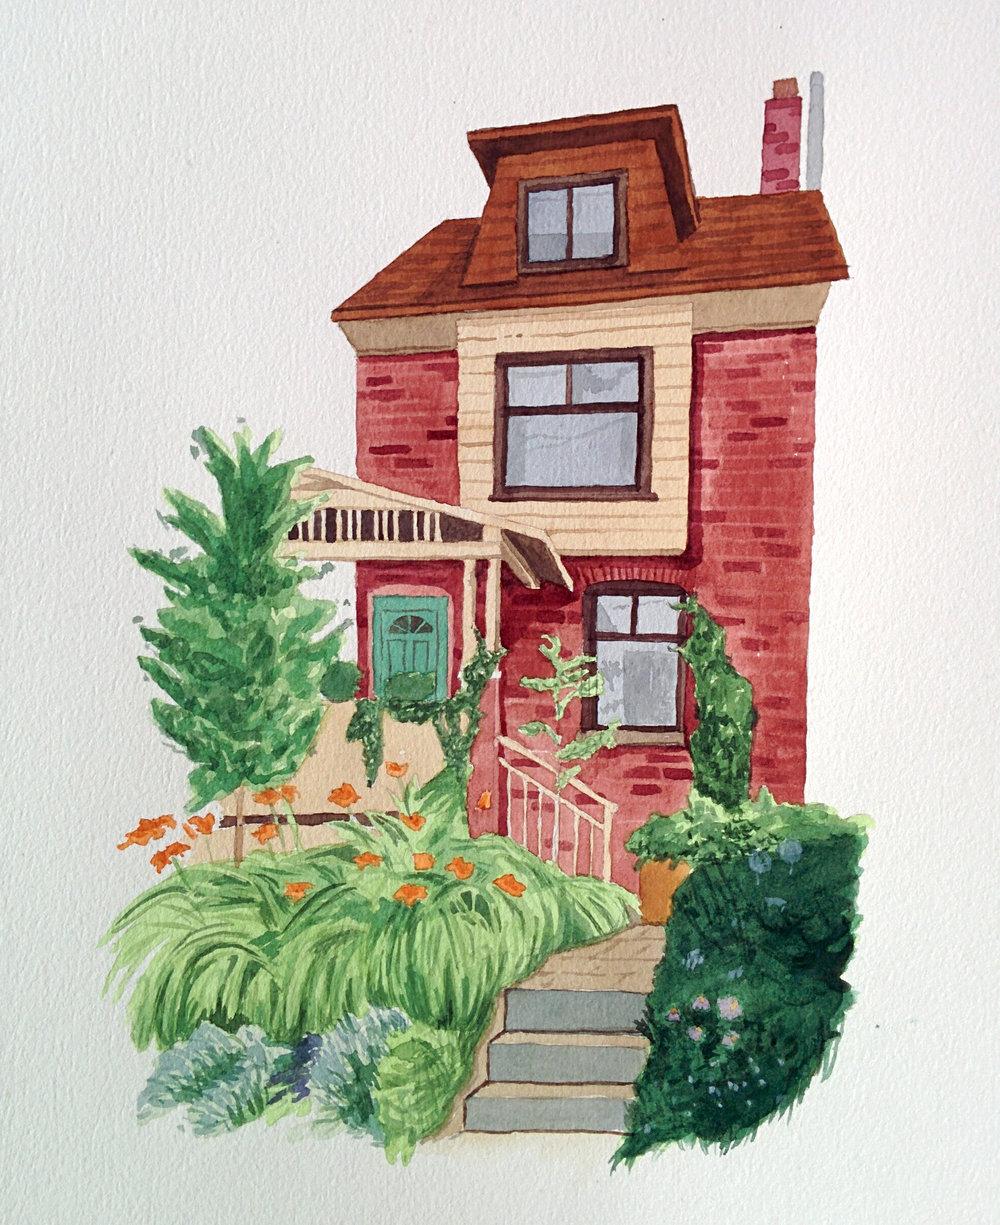 10 Duplex with Lilies.jpg